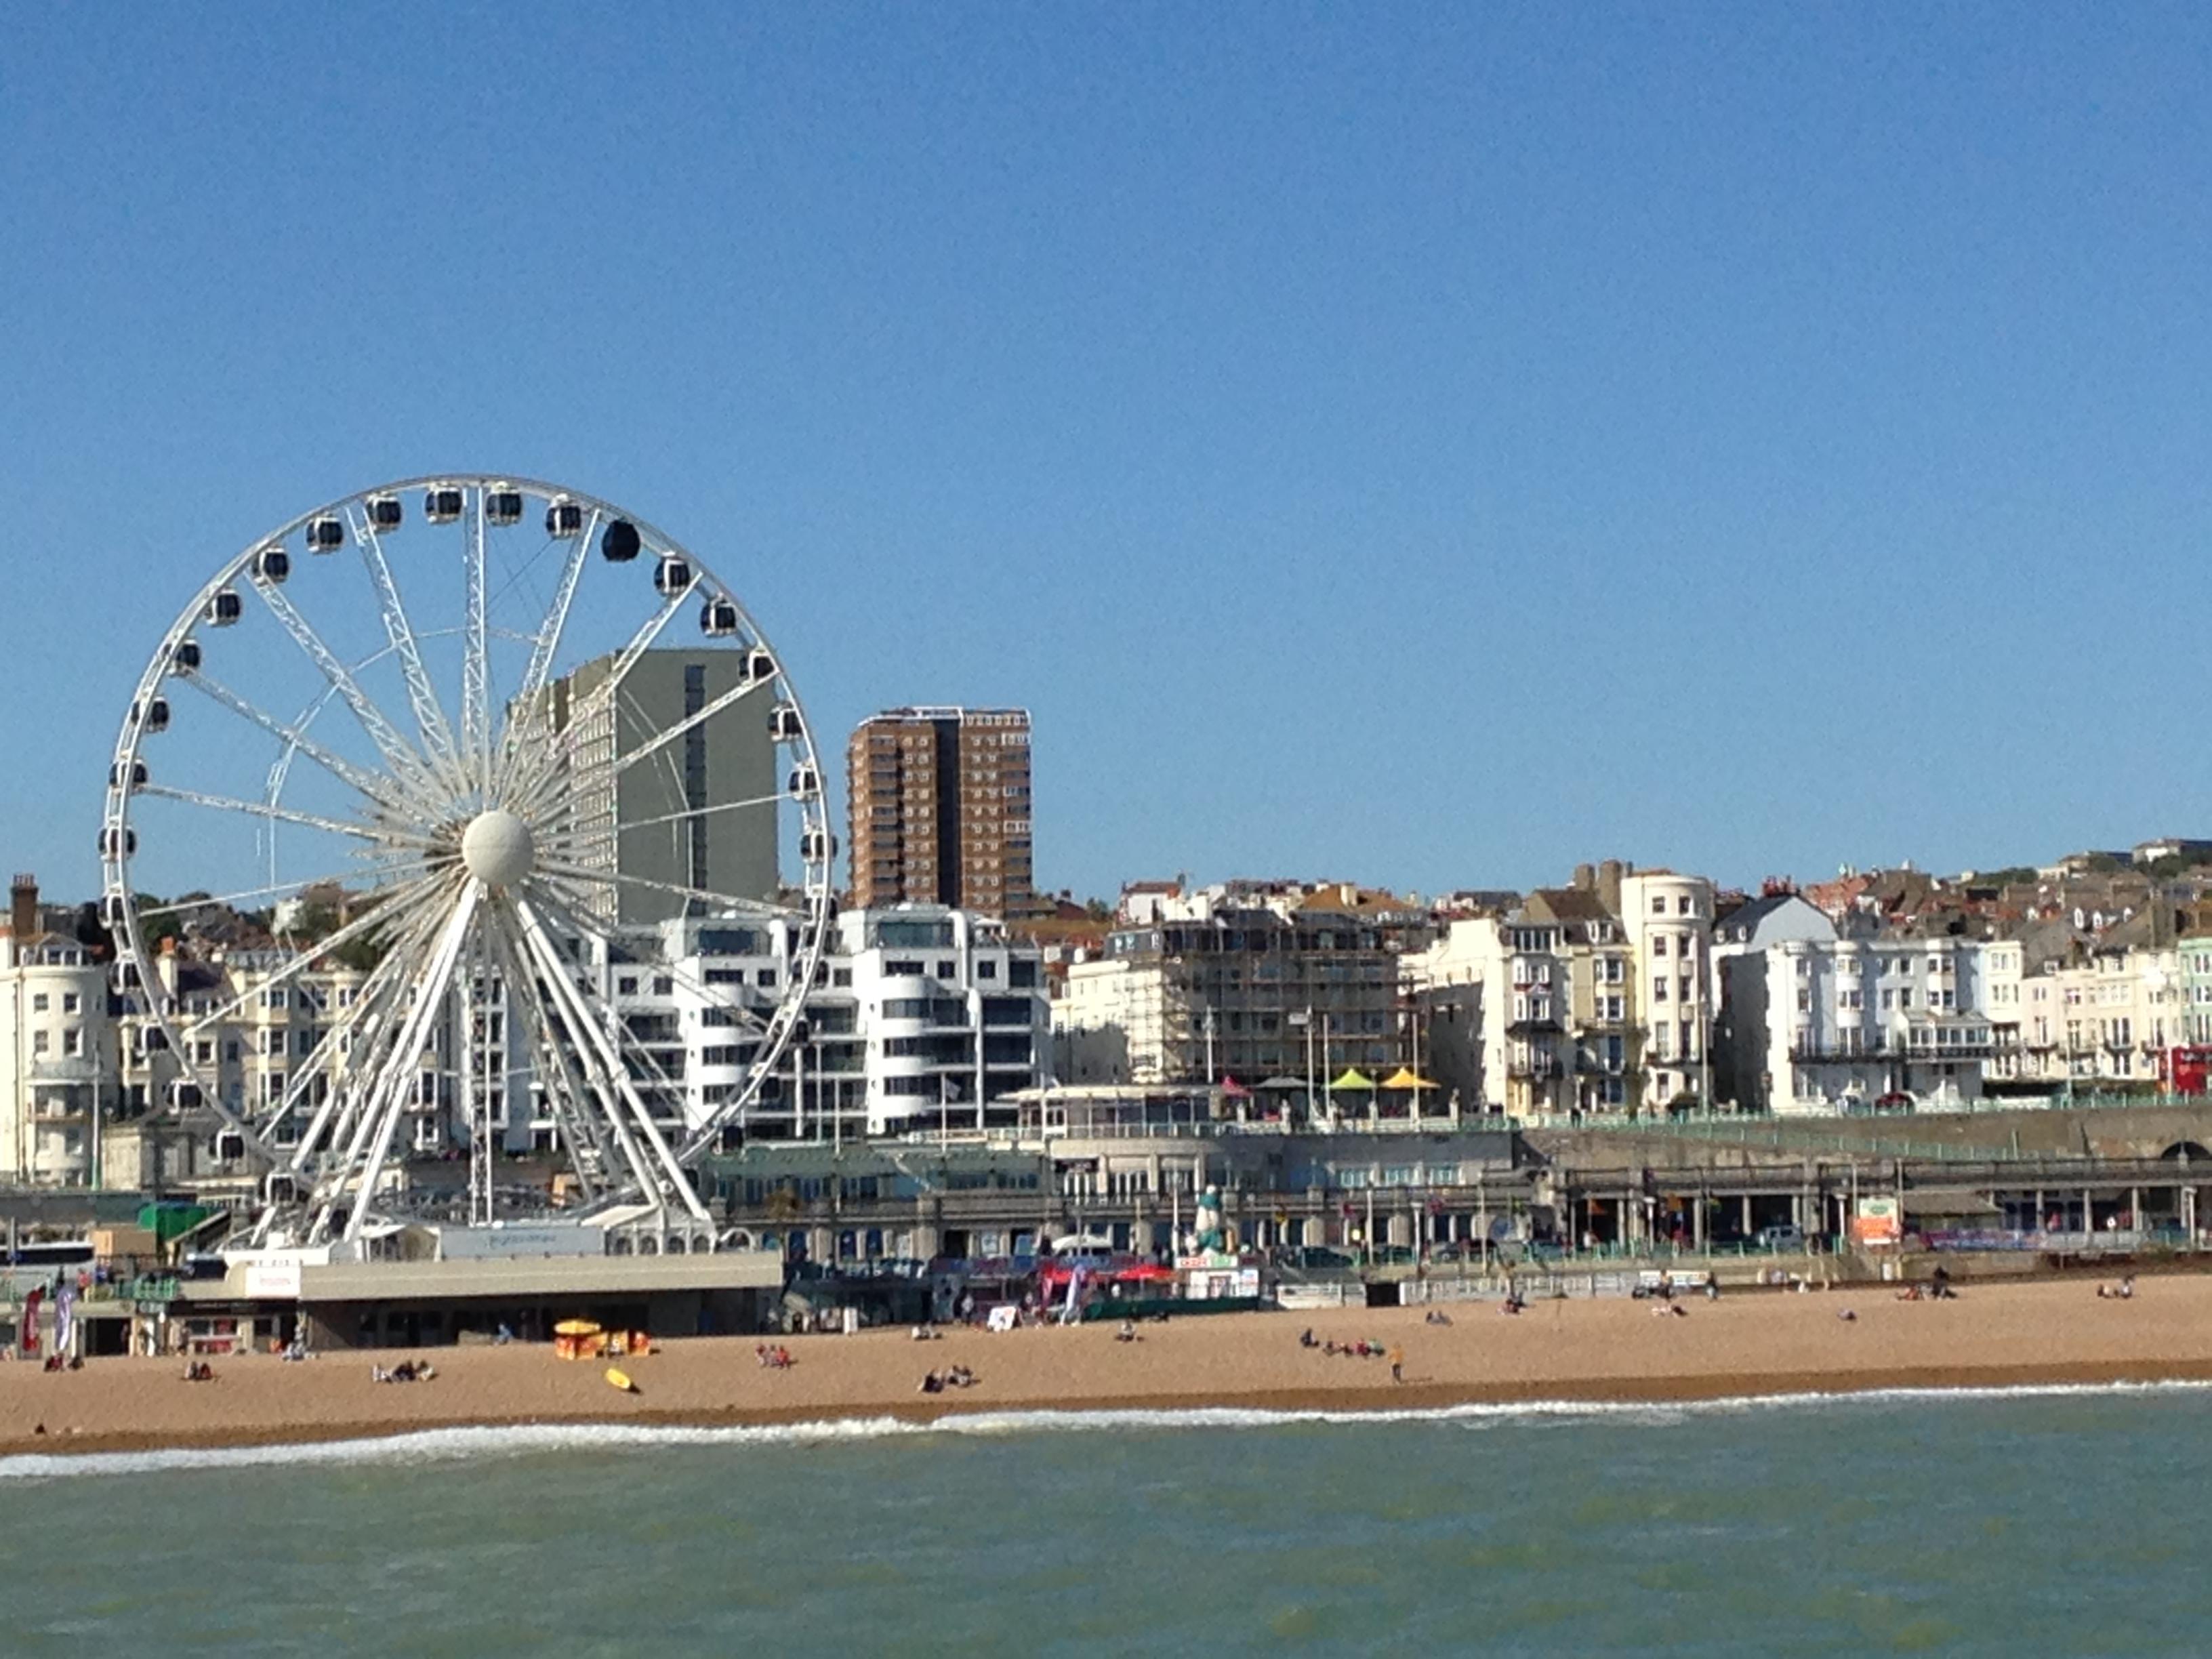 All Sunshine in Brighton, England today!